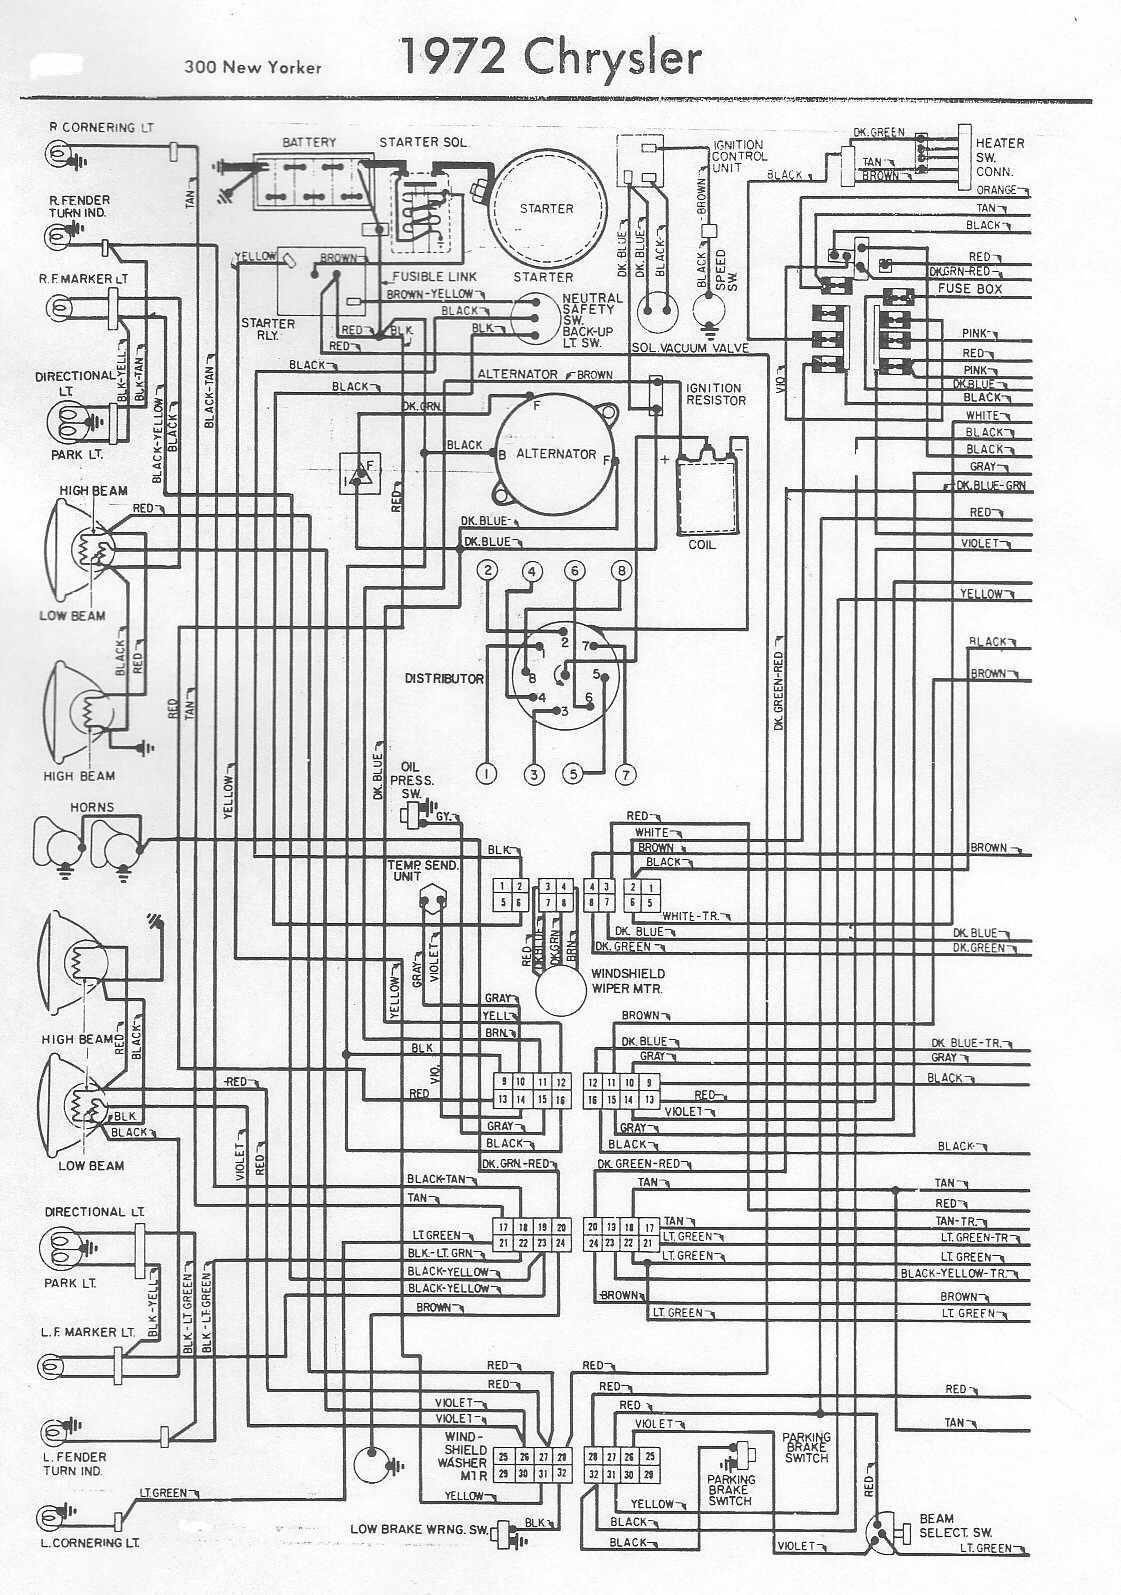 small resolution of 1985 chrysler new yorker wiring diagram best secret wiring diagram u2022 1985 chrysler 5th avenue 1985 chrysler lebaron wiring diagram